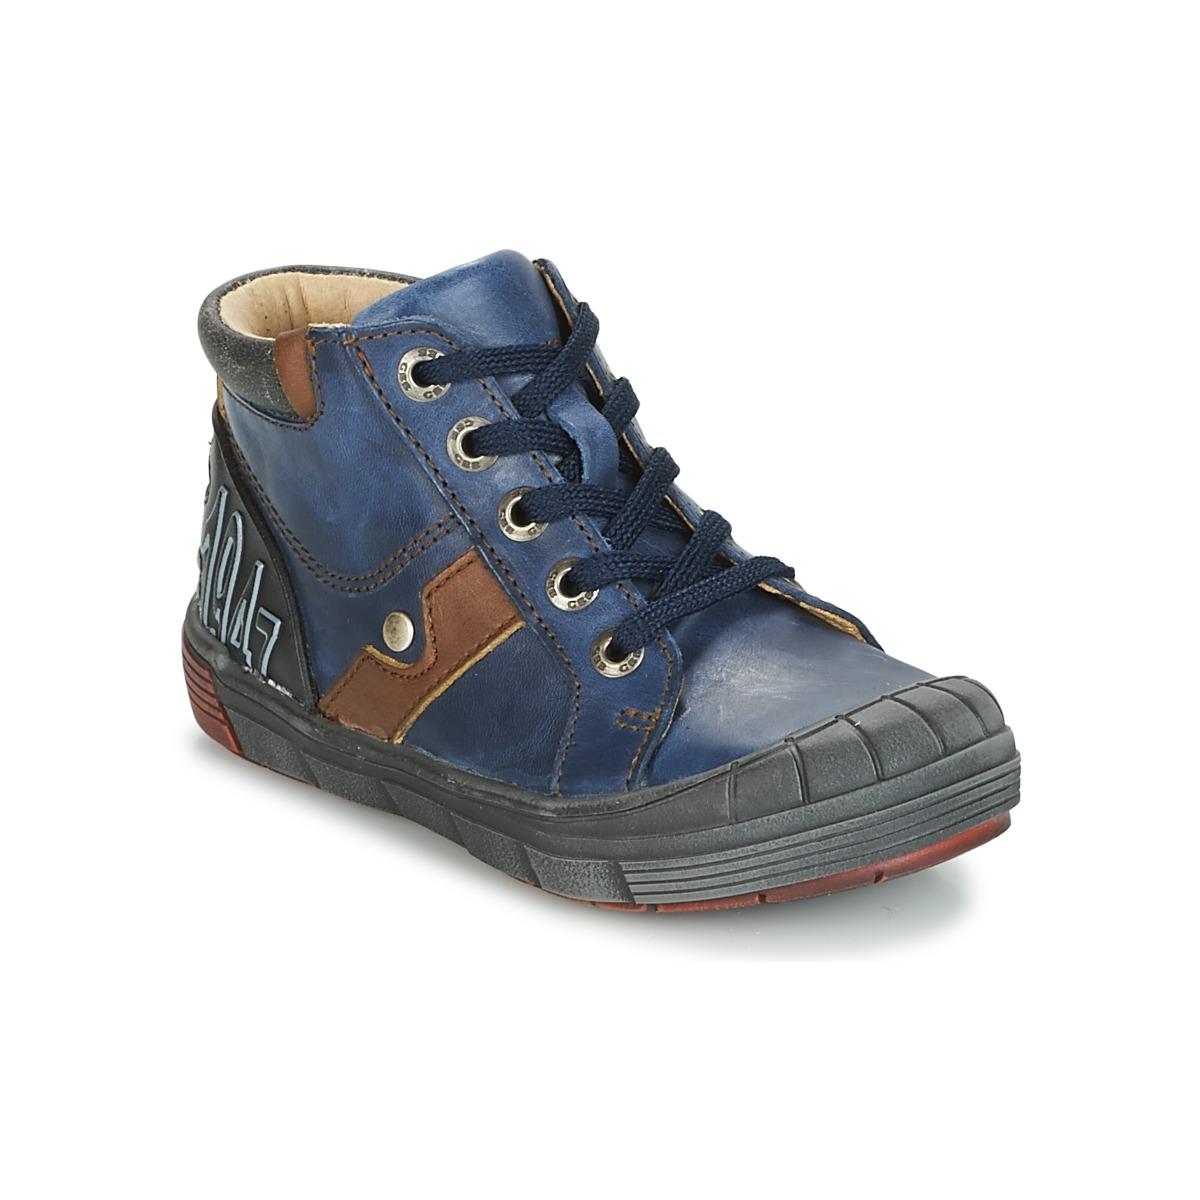 GBB RENOLD Marine / Dpf / 2831 - Kostenloser Versand bei Spartoode ! - Schuhe Sneaker High  59,50 €